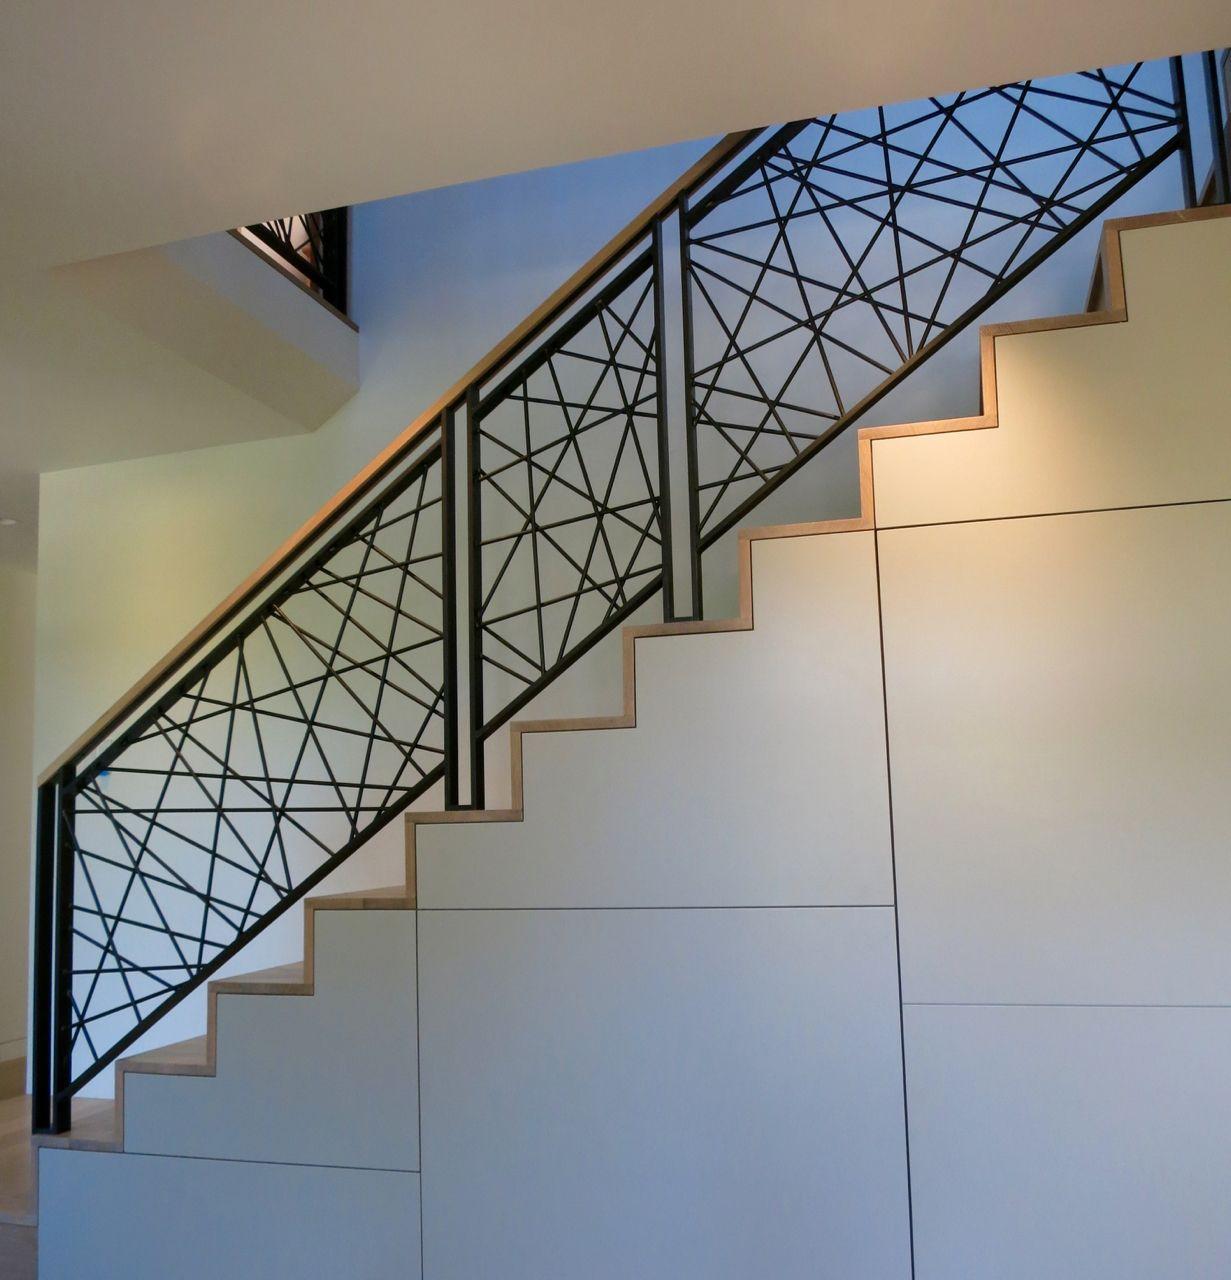 Best Image Result For Mezzanine Handrail Balustrade Industrial 400 x 300